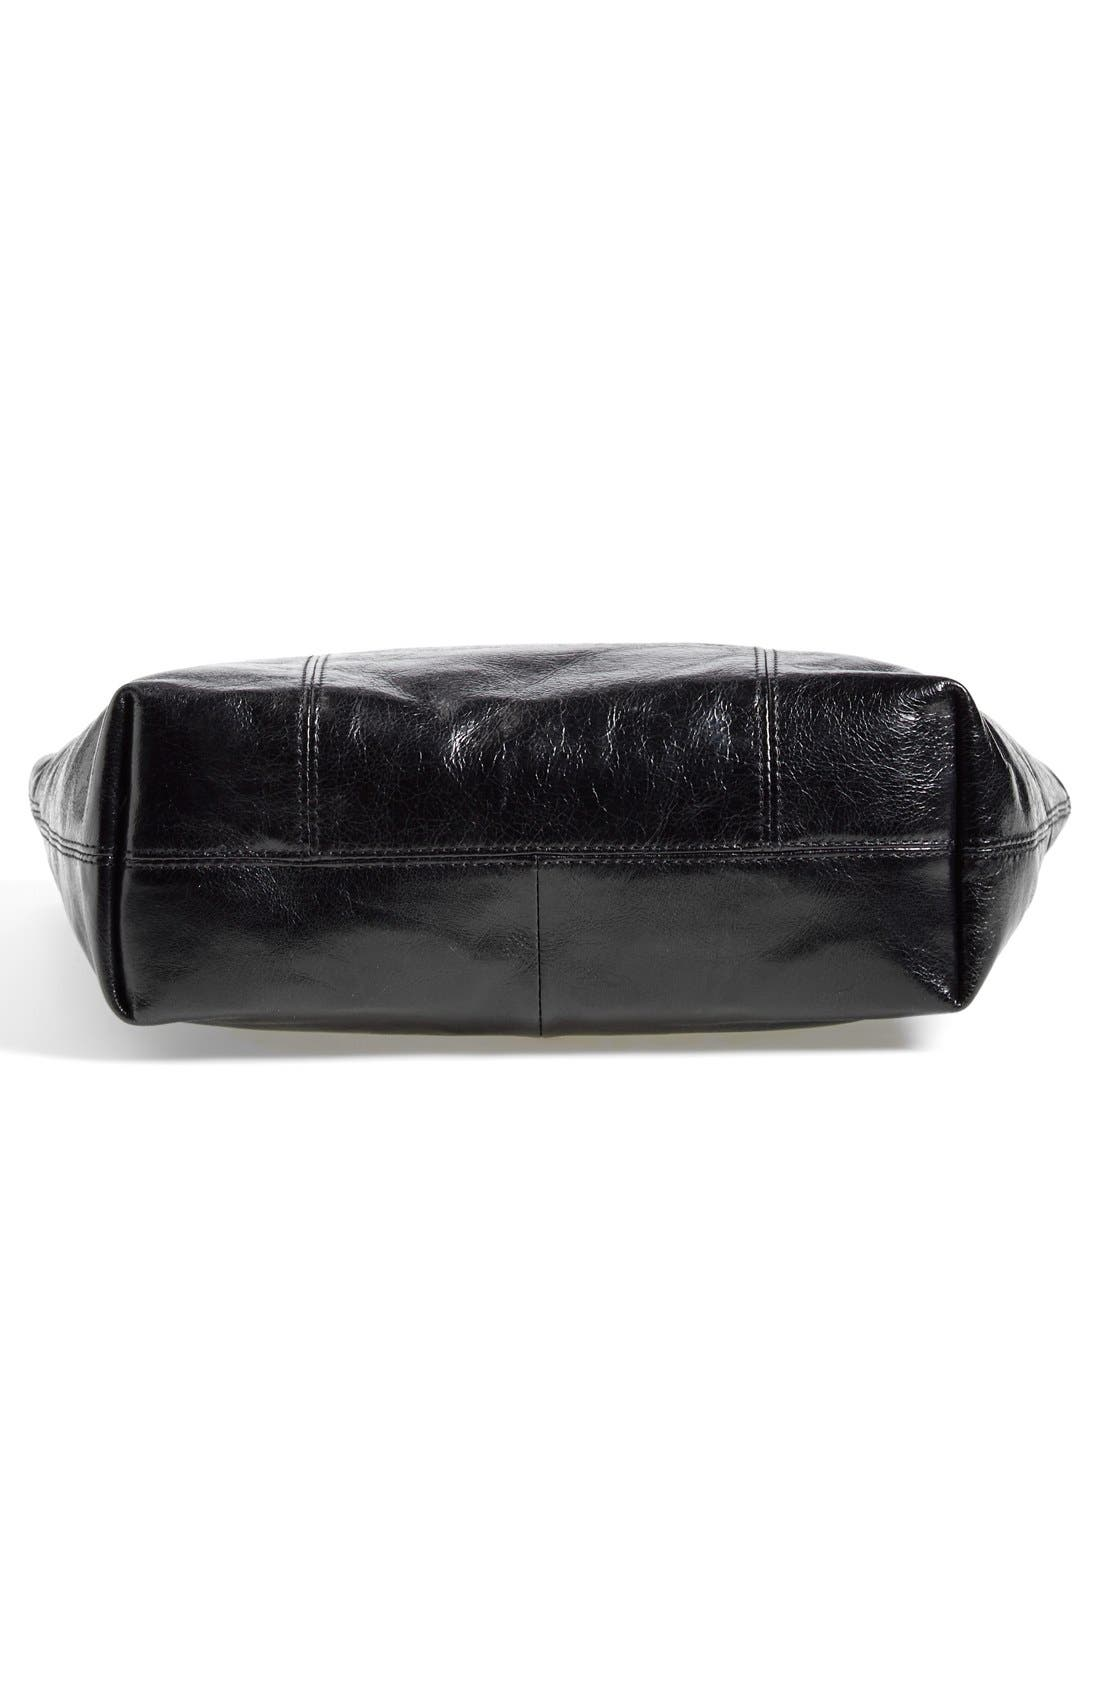 'Cecily' Mini Leather Tote,                             Alternate thumbnail 2, color,                             001